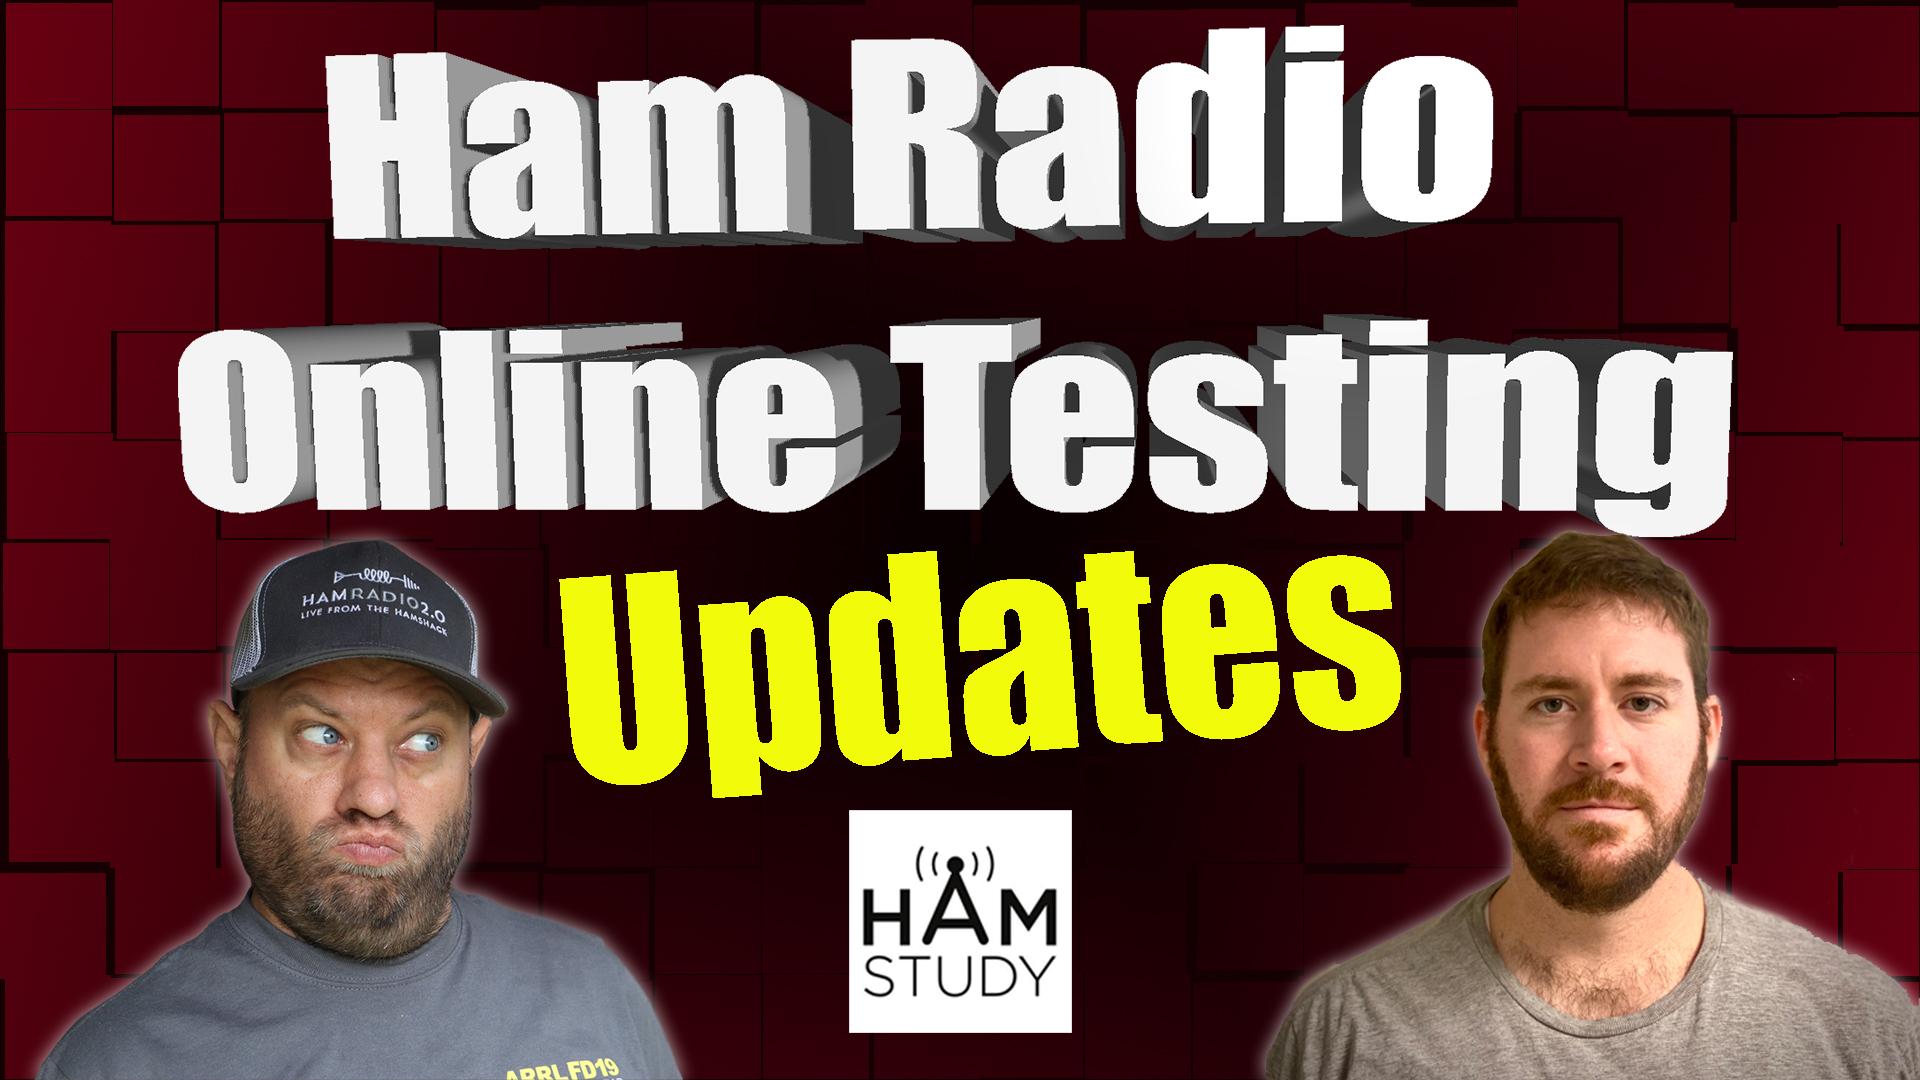 Episode 341: Ham Radio Online Testing Updates – YES MORE!